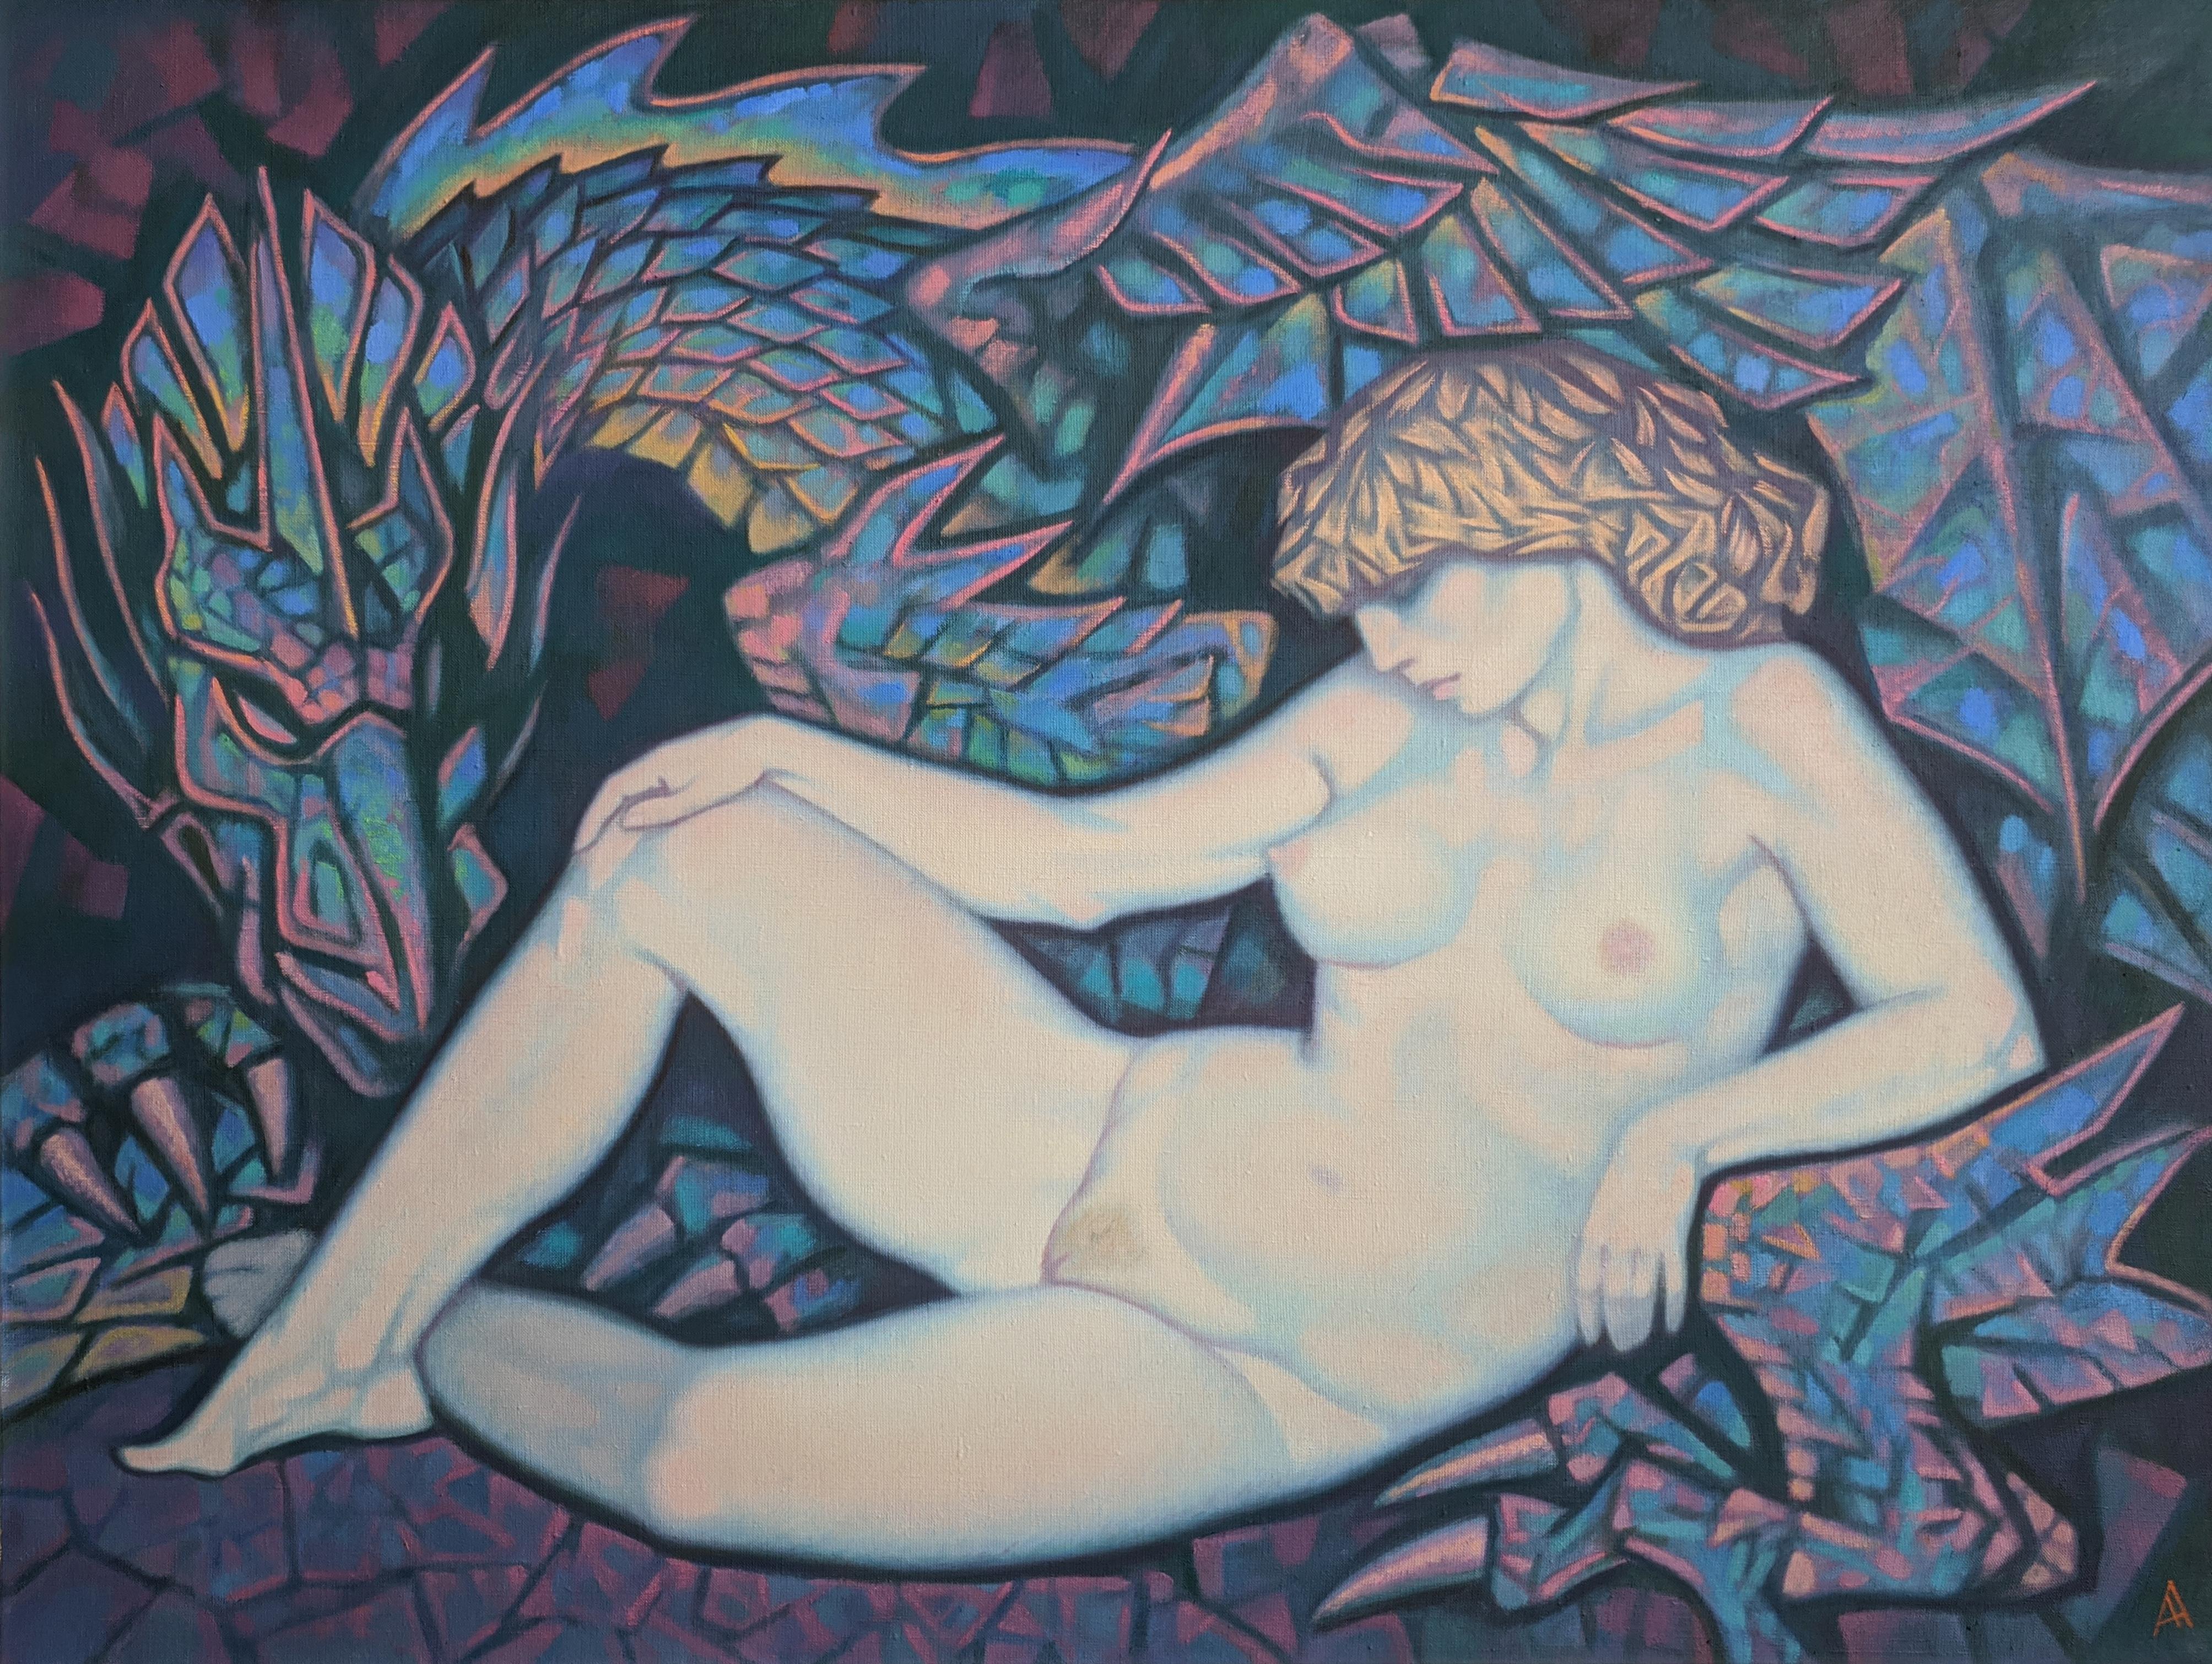 Андромеда - картина художника Анатолия Алексеева